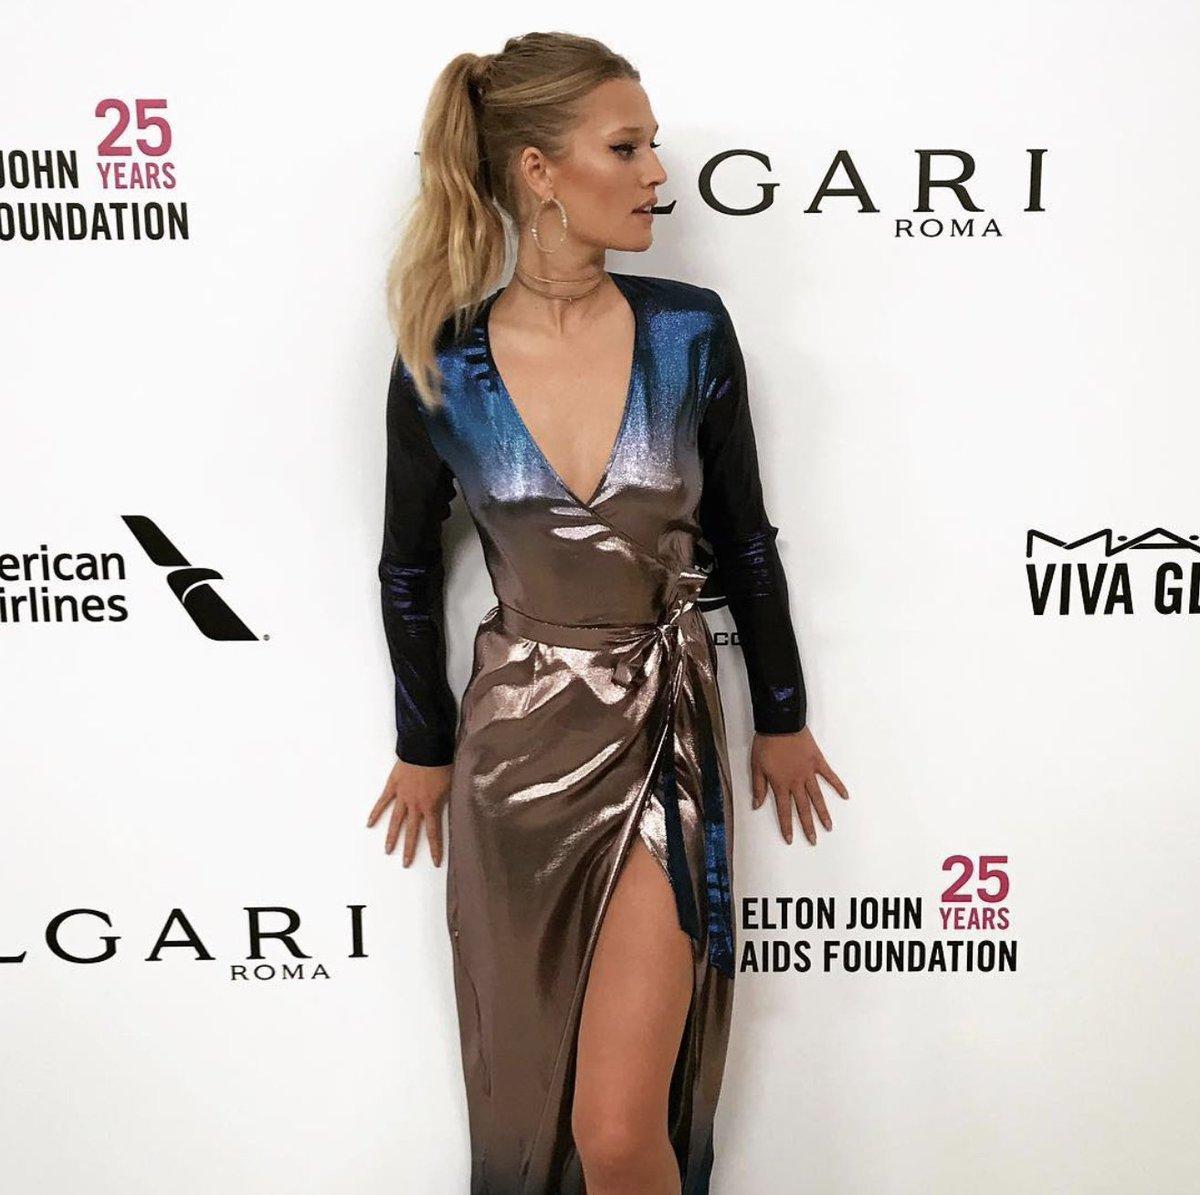 Toni garrn sexy photos - 2019 year